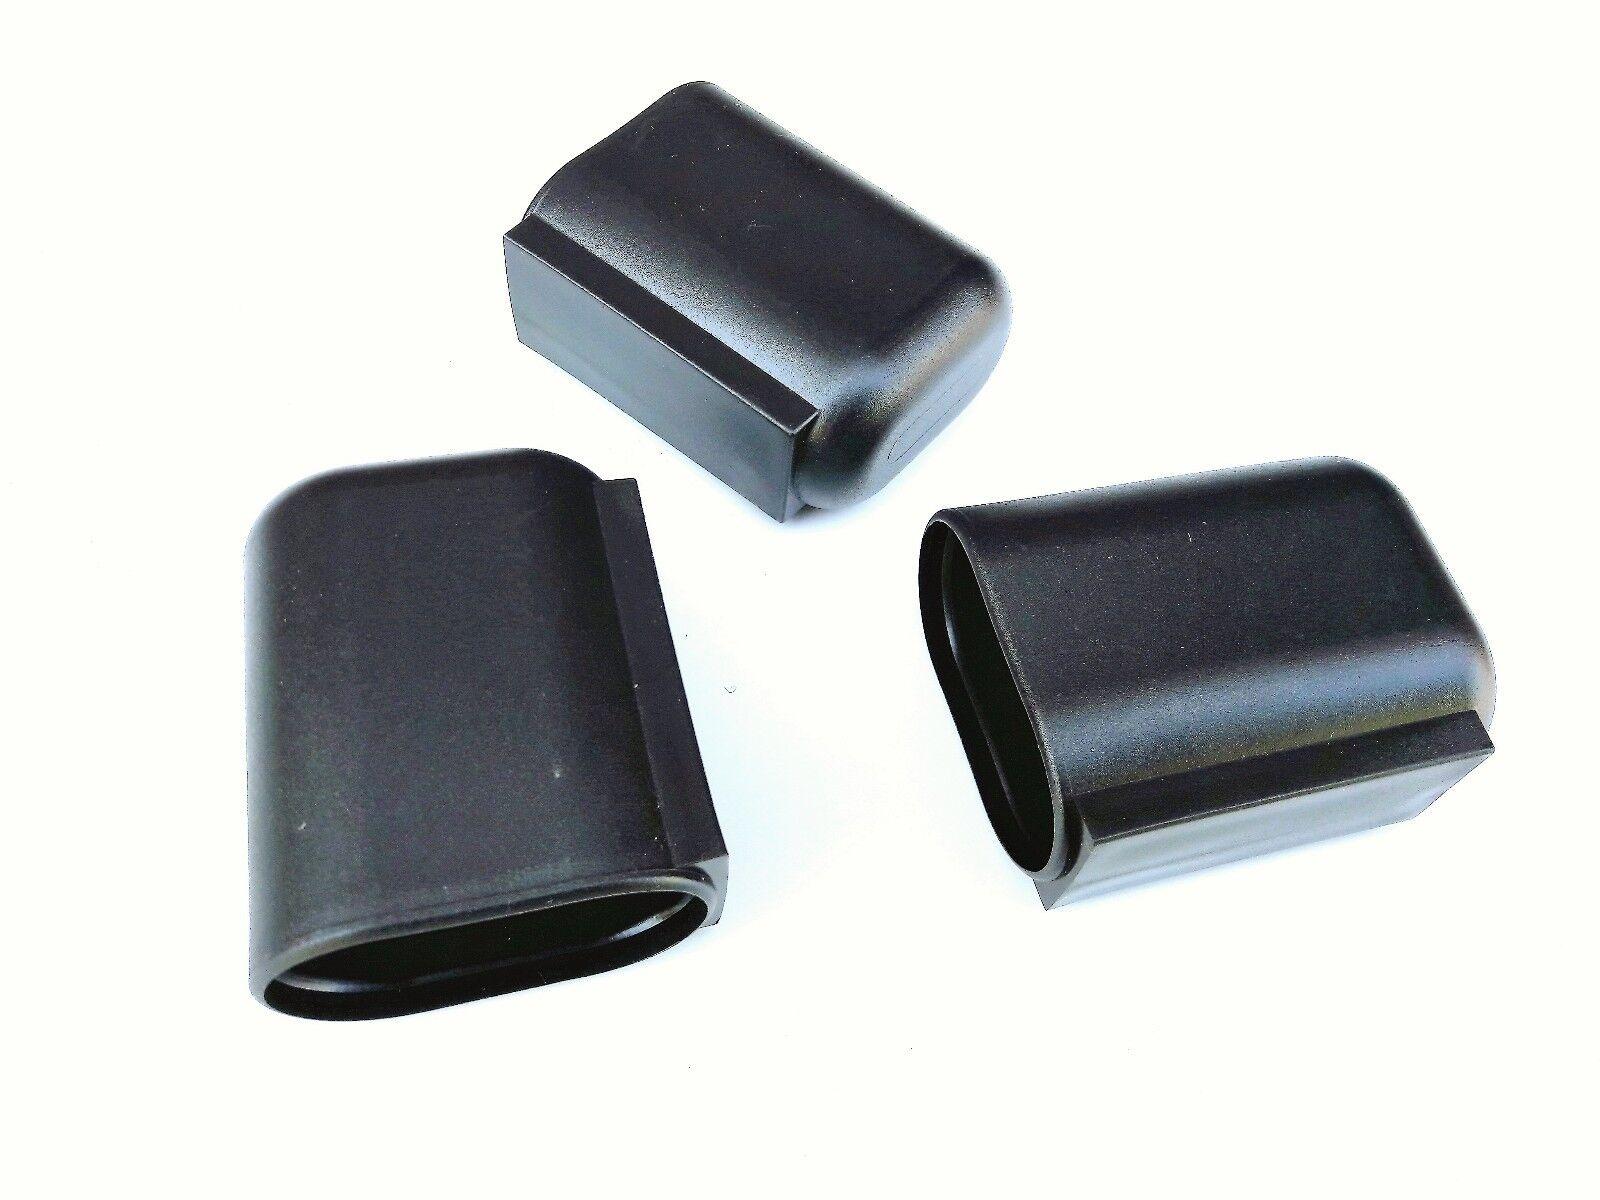 Stuhlgleiter Oval wahlweise mit Filz Tischgleiter Möbel Kappe Kunststoff Gleiter